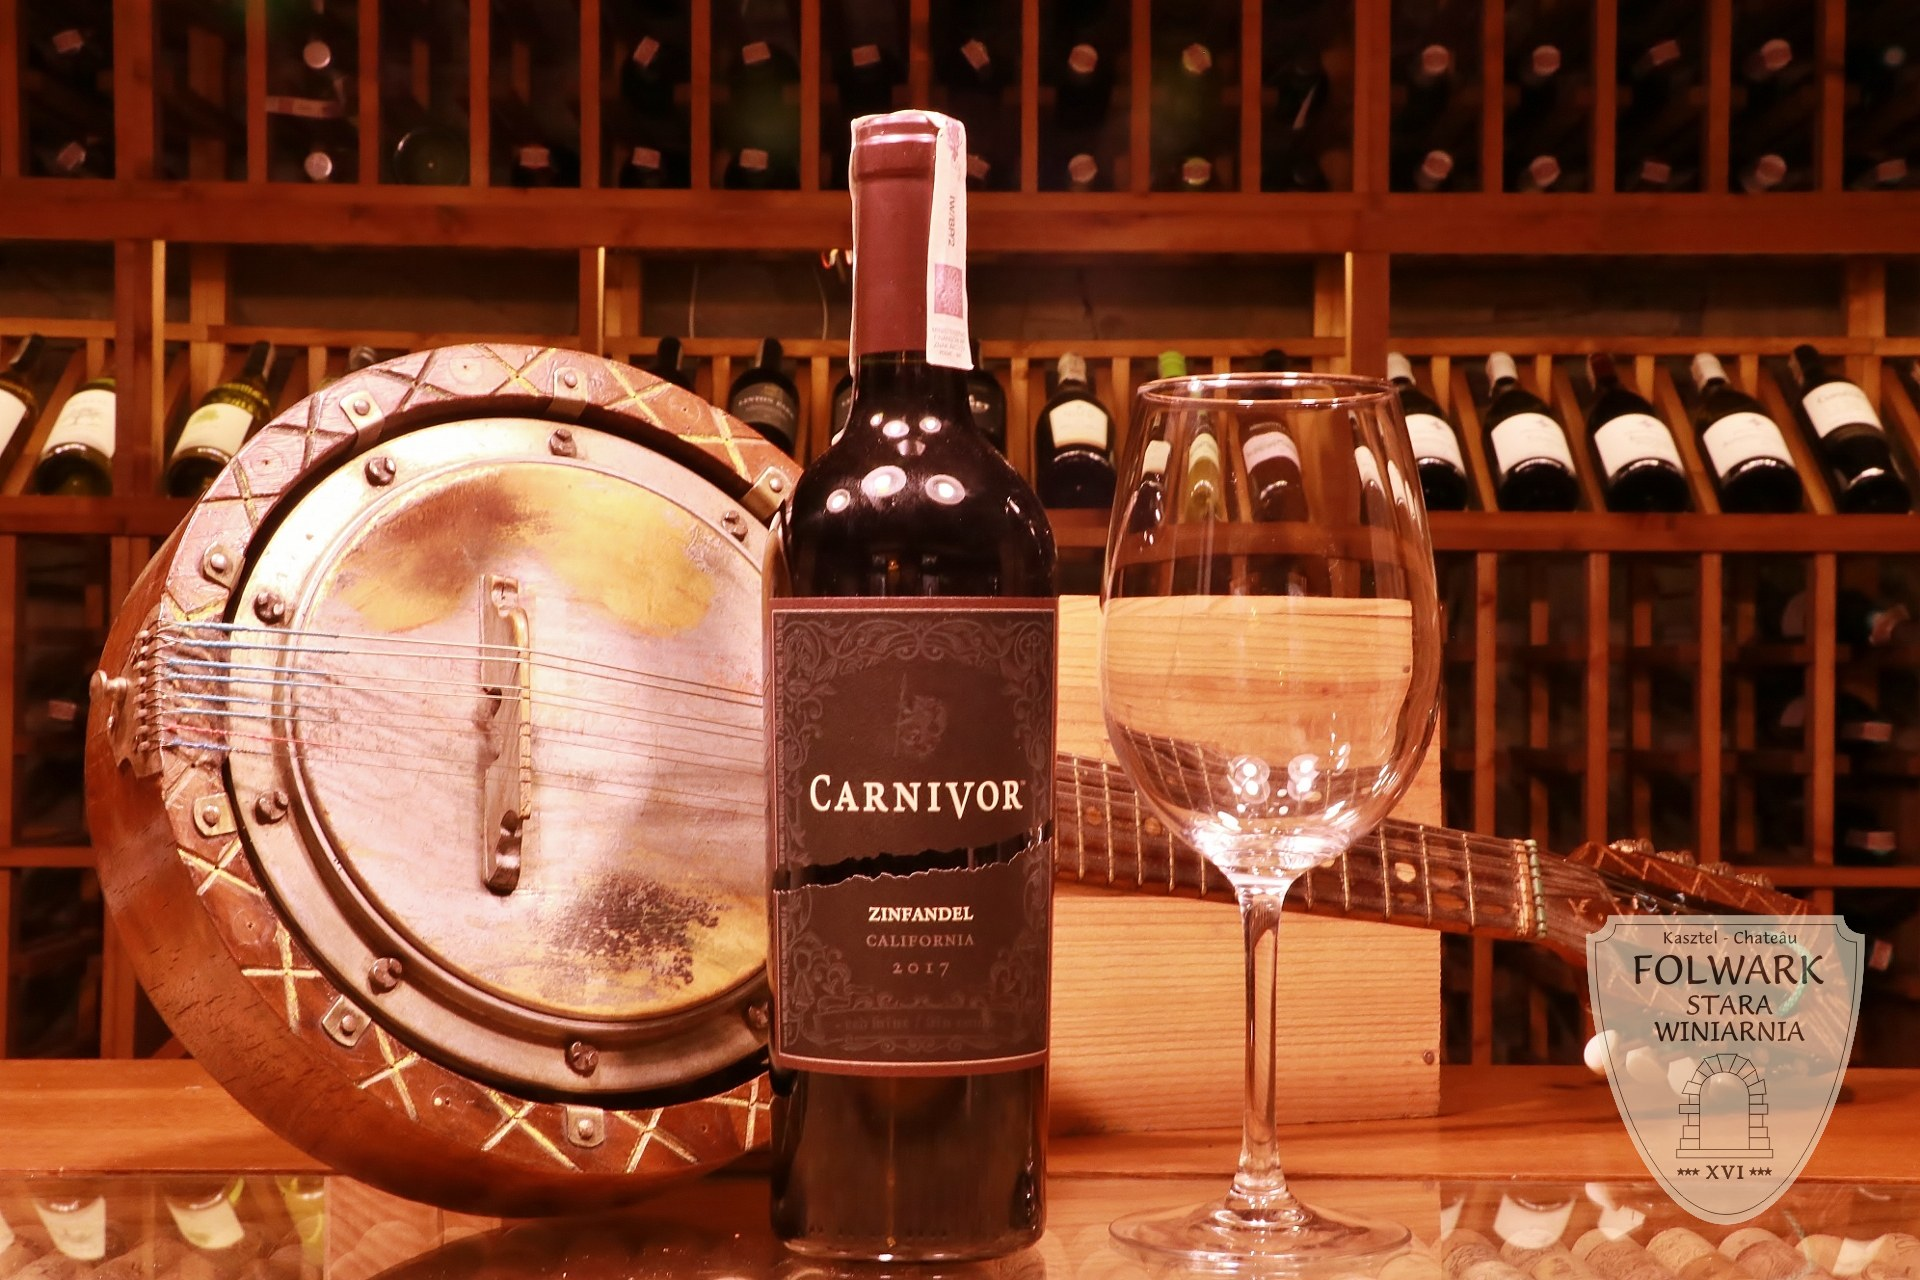 Carnivor Zinfandel Kalifornia